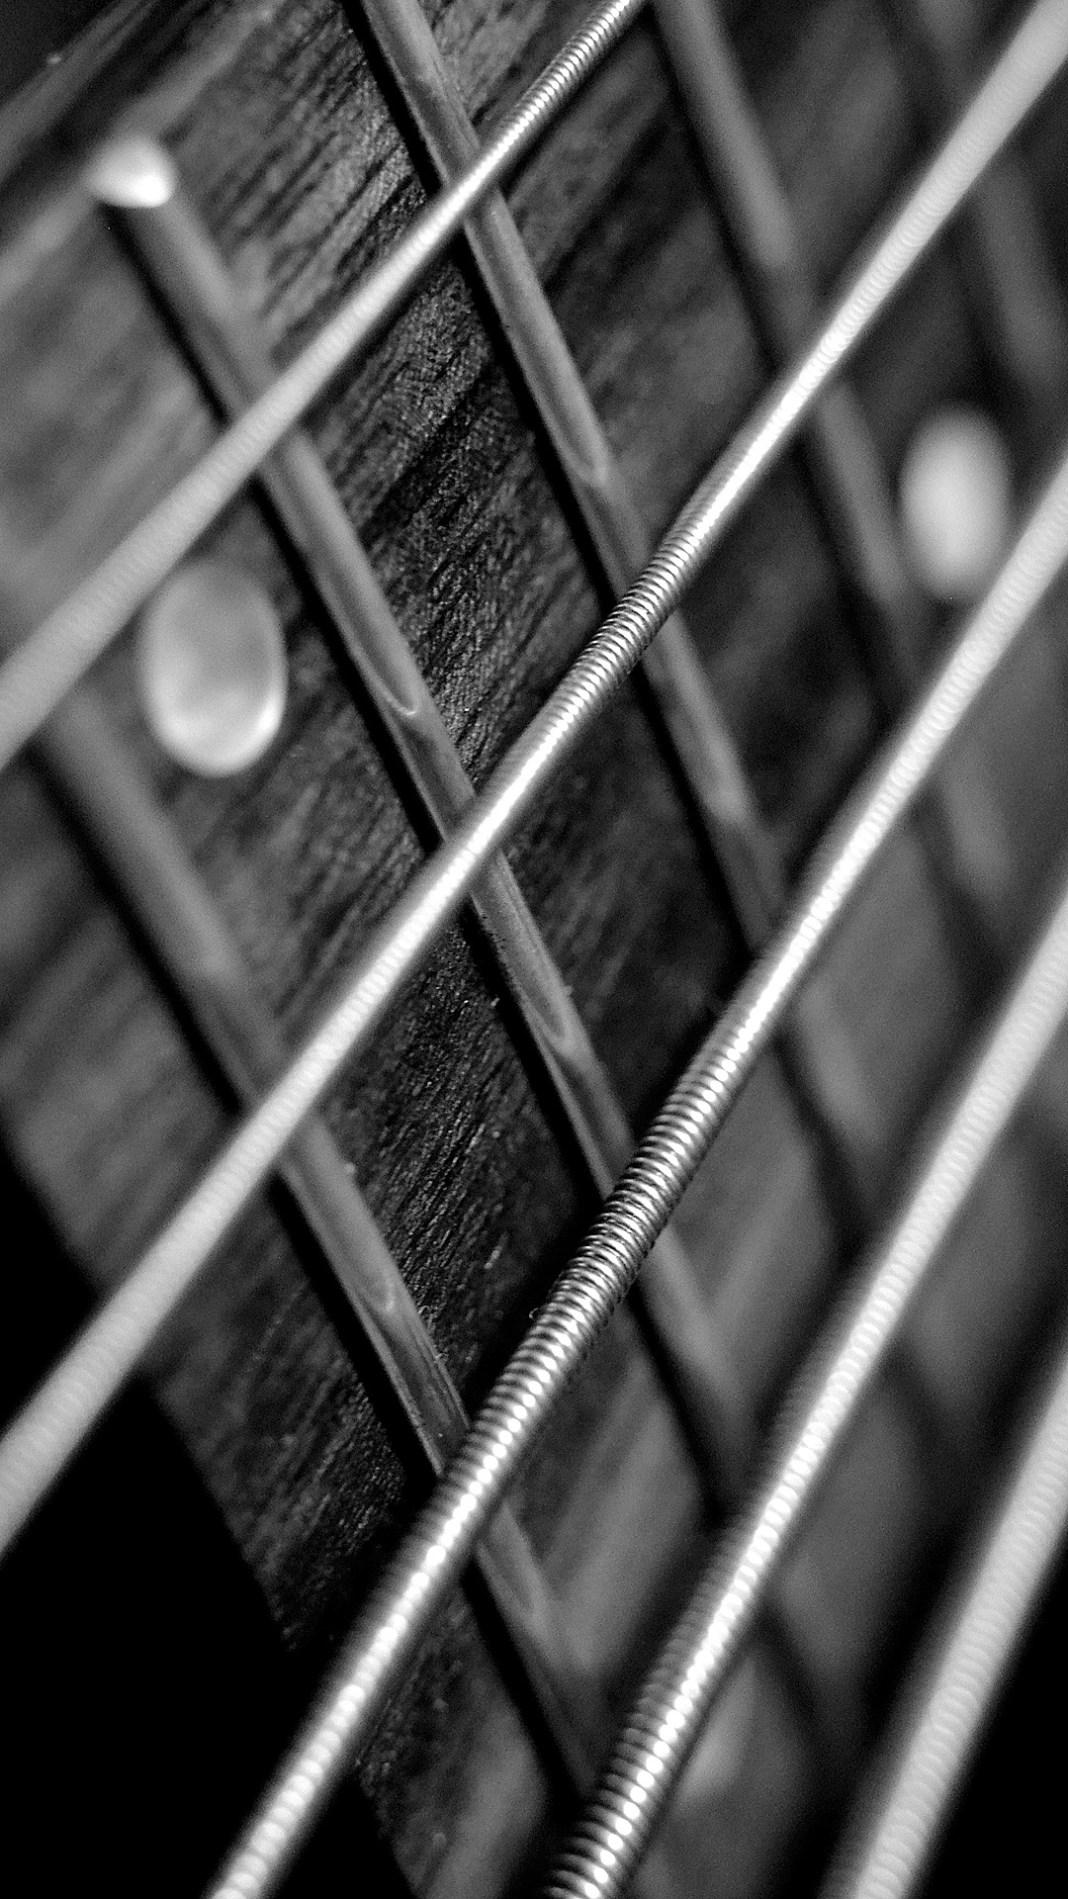 guitar-chords-6647